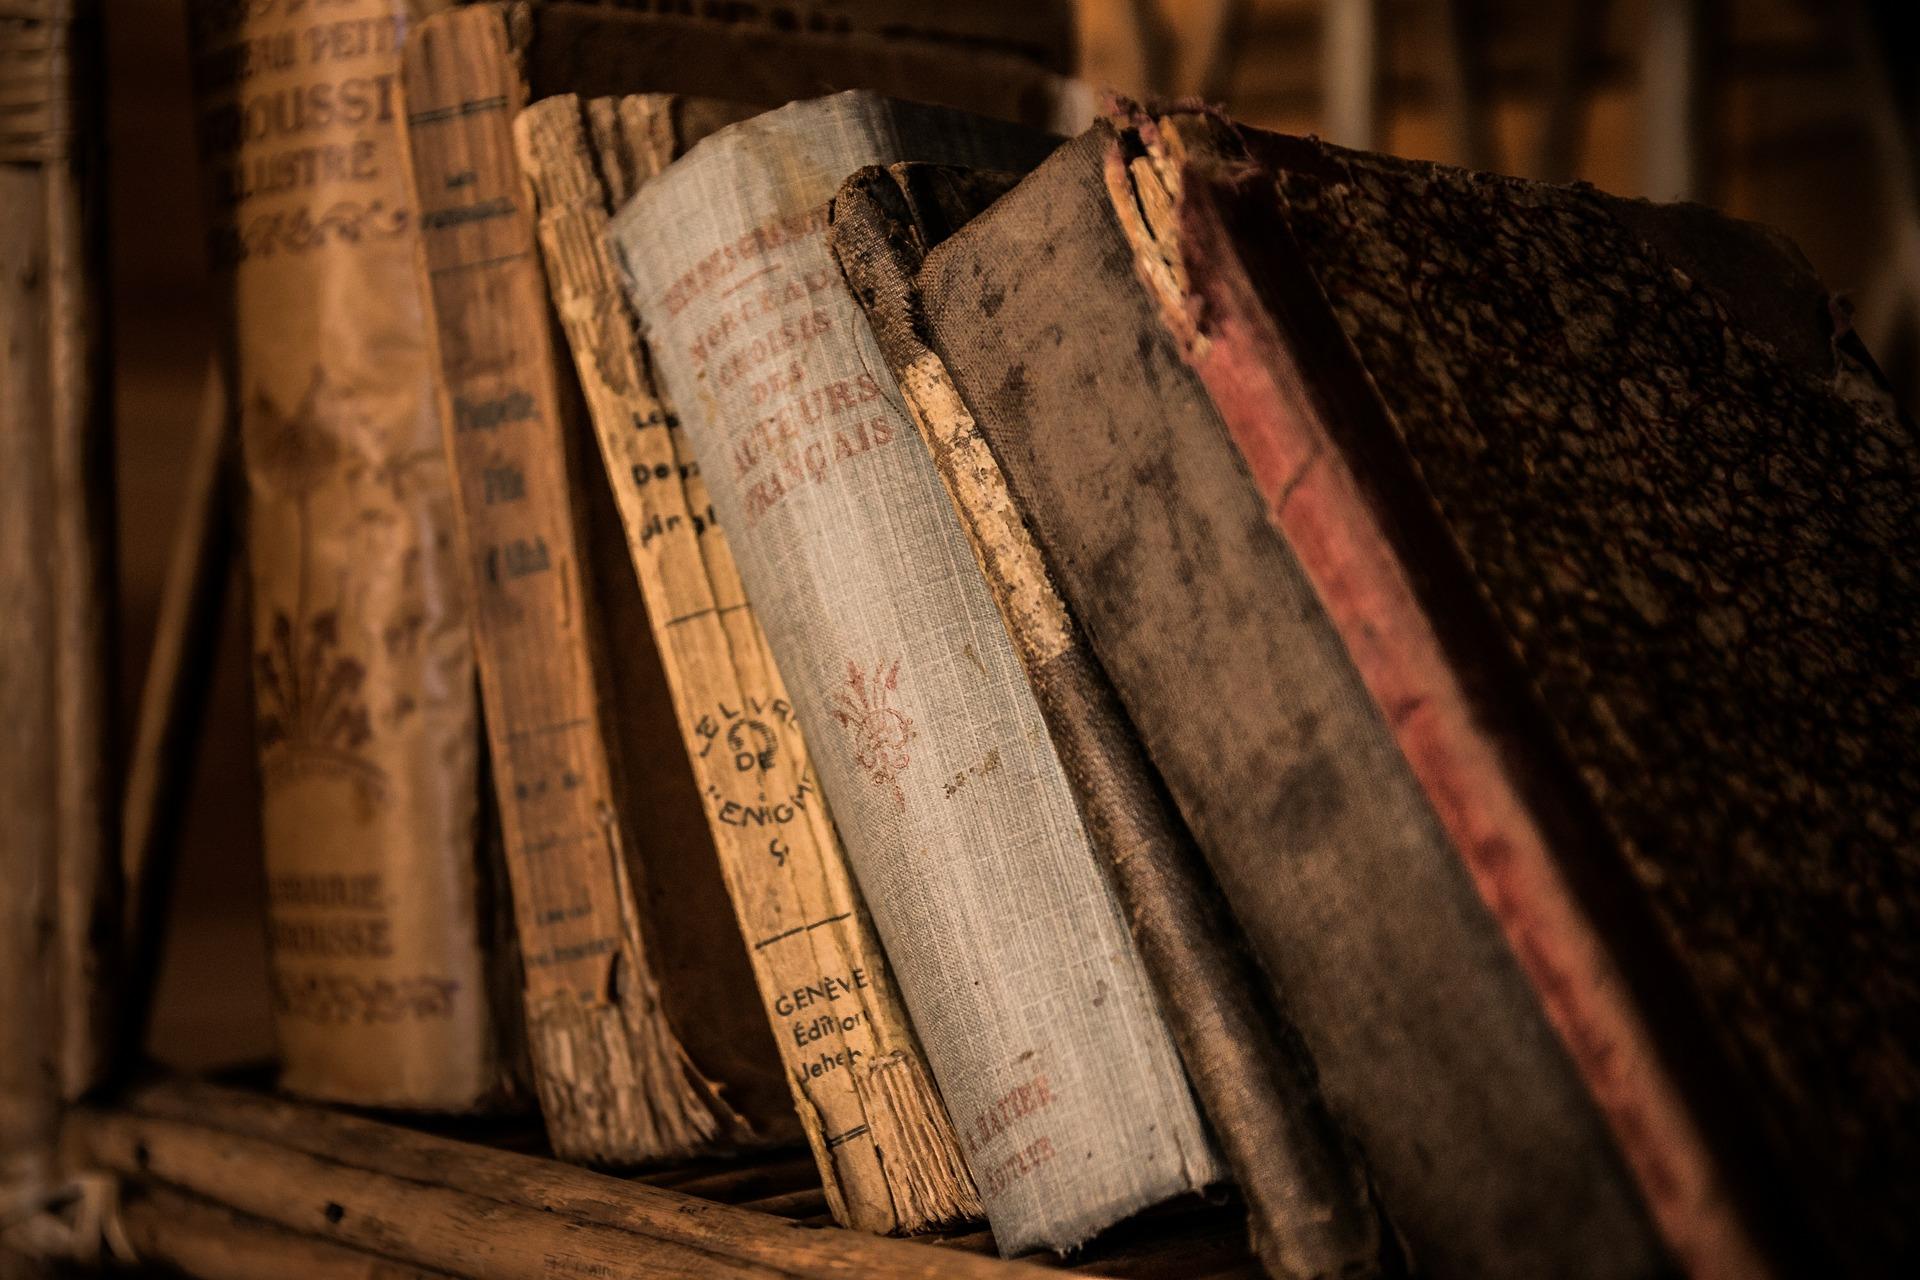 Books about England | © Jarmoluk pixabay.com